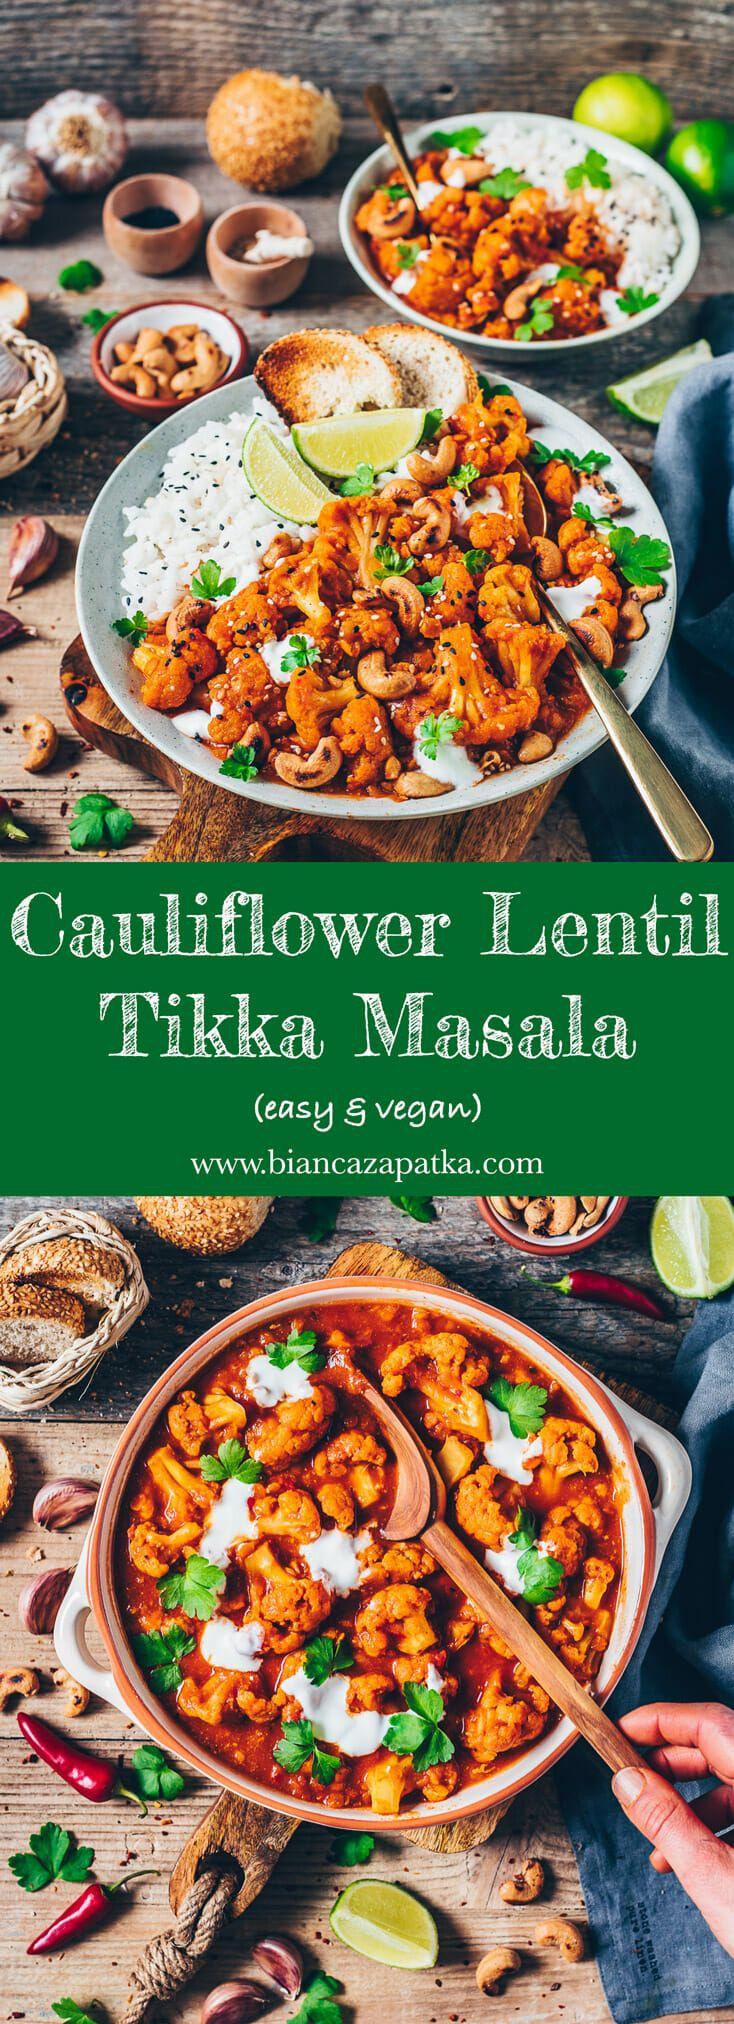 Cauliflower Tikka Masala (easy & vegan) - Bianca Zapatka | Recipes